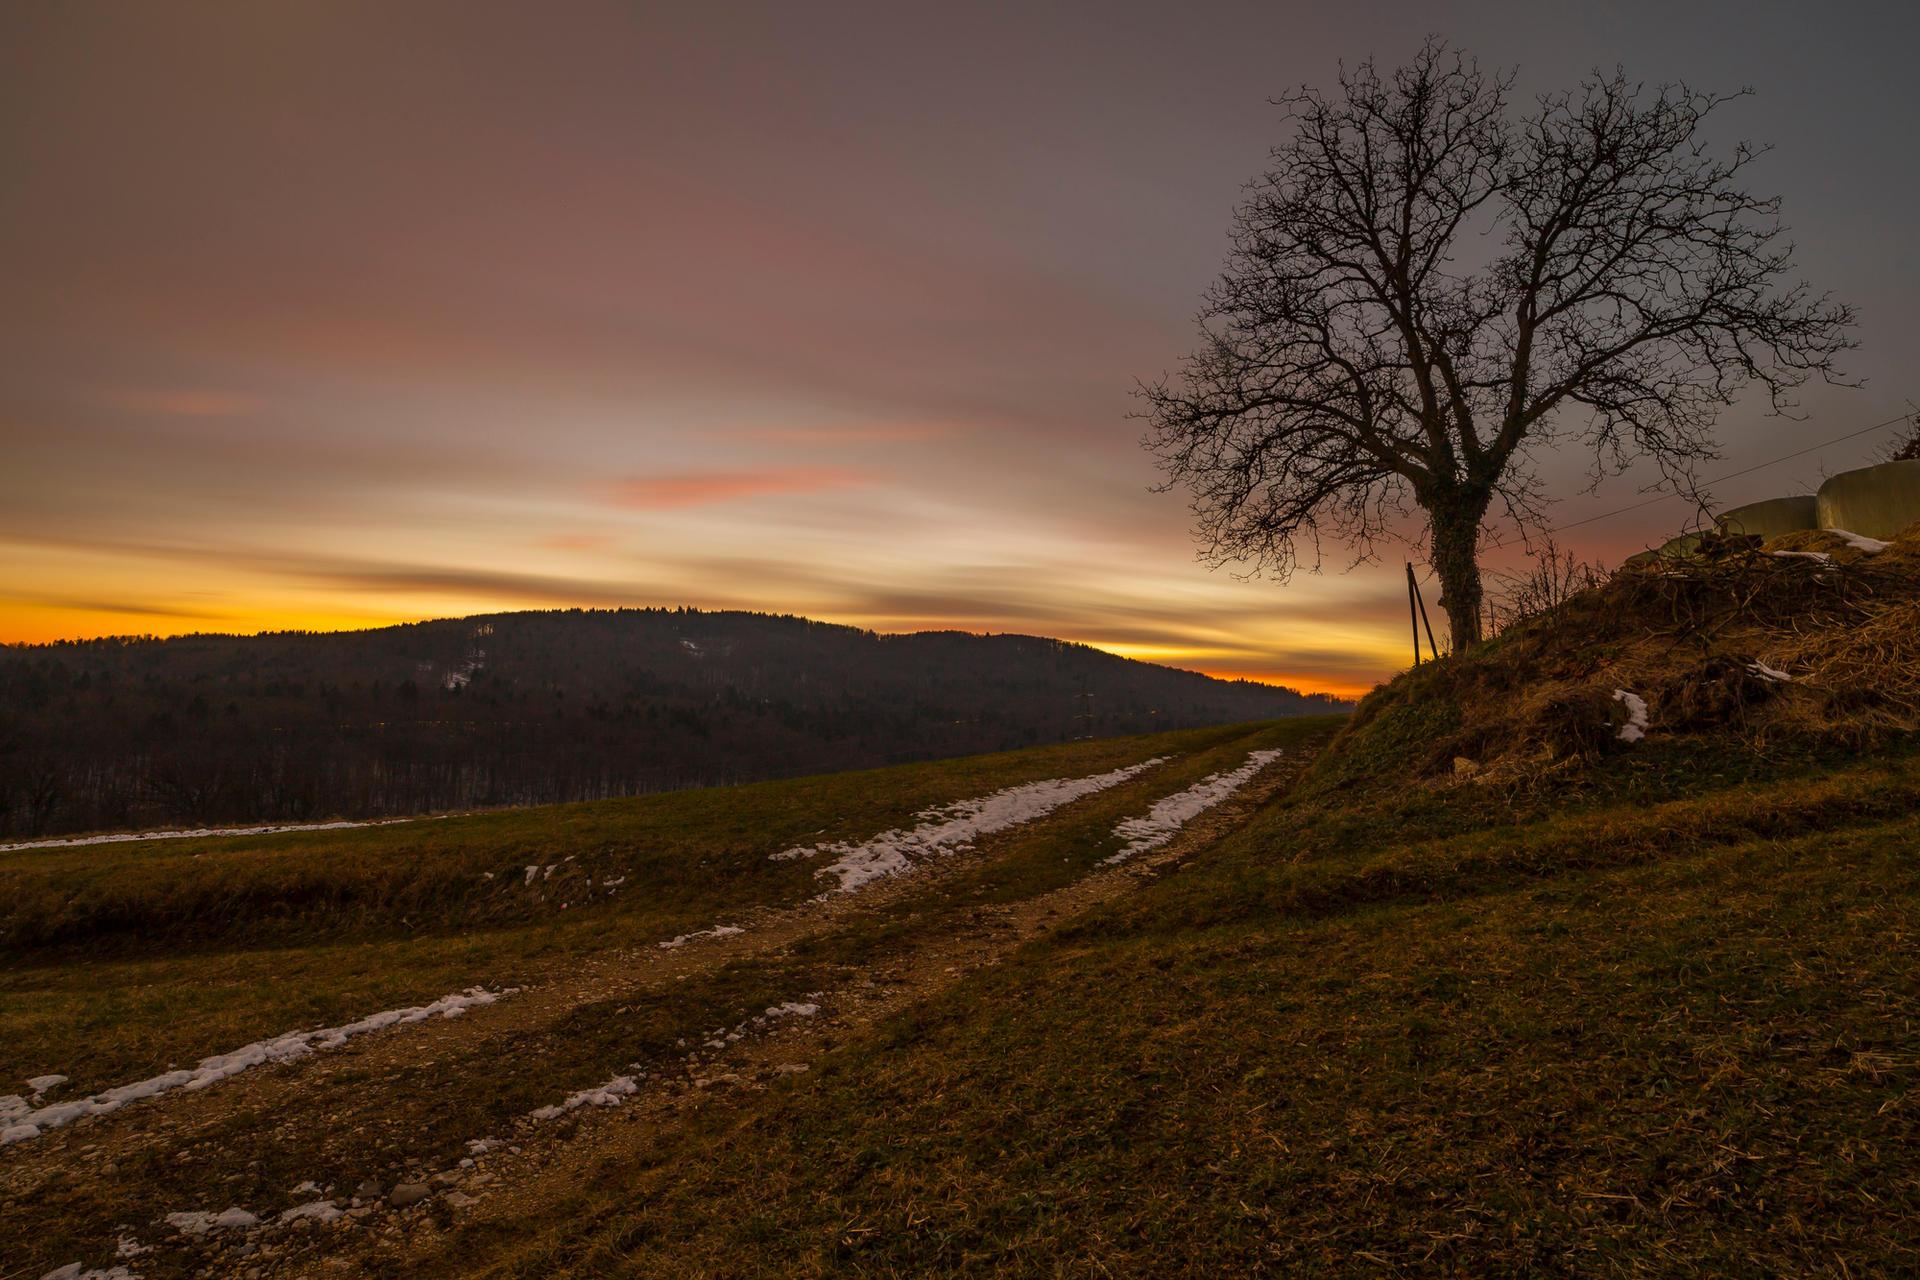 Beautiful sunset over Slovenian rural landscape